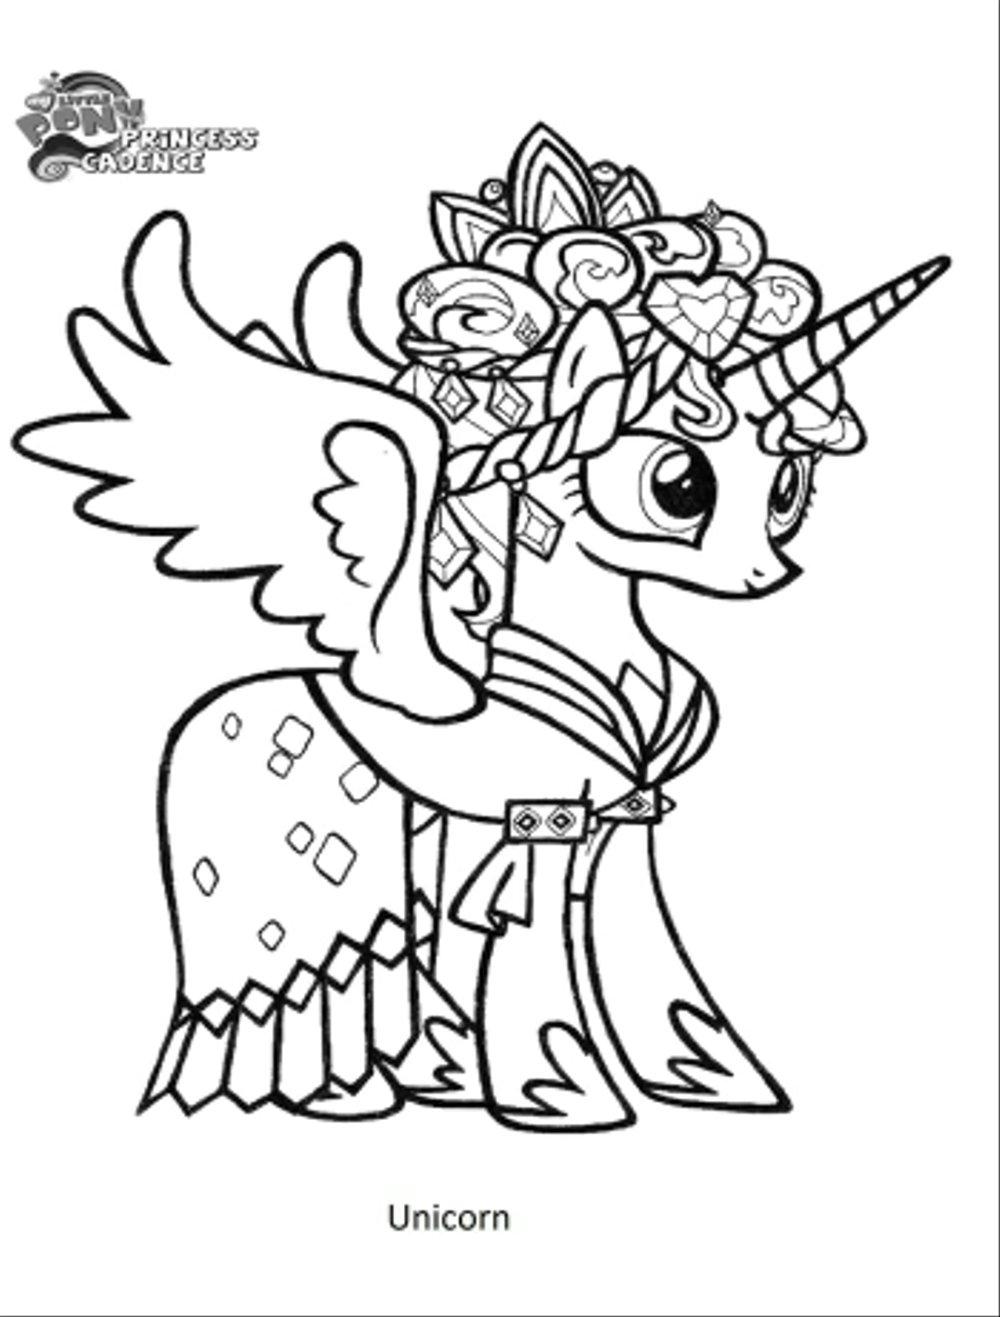 Gambar Mewarnai Anak Unicorn Wwwtollebildcom